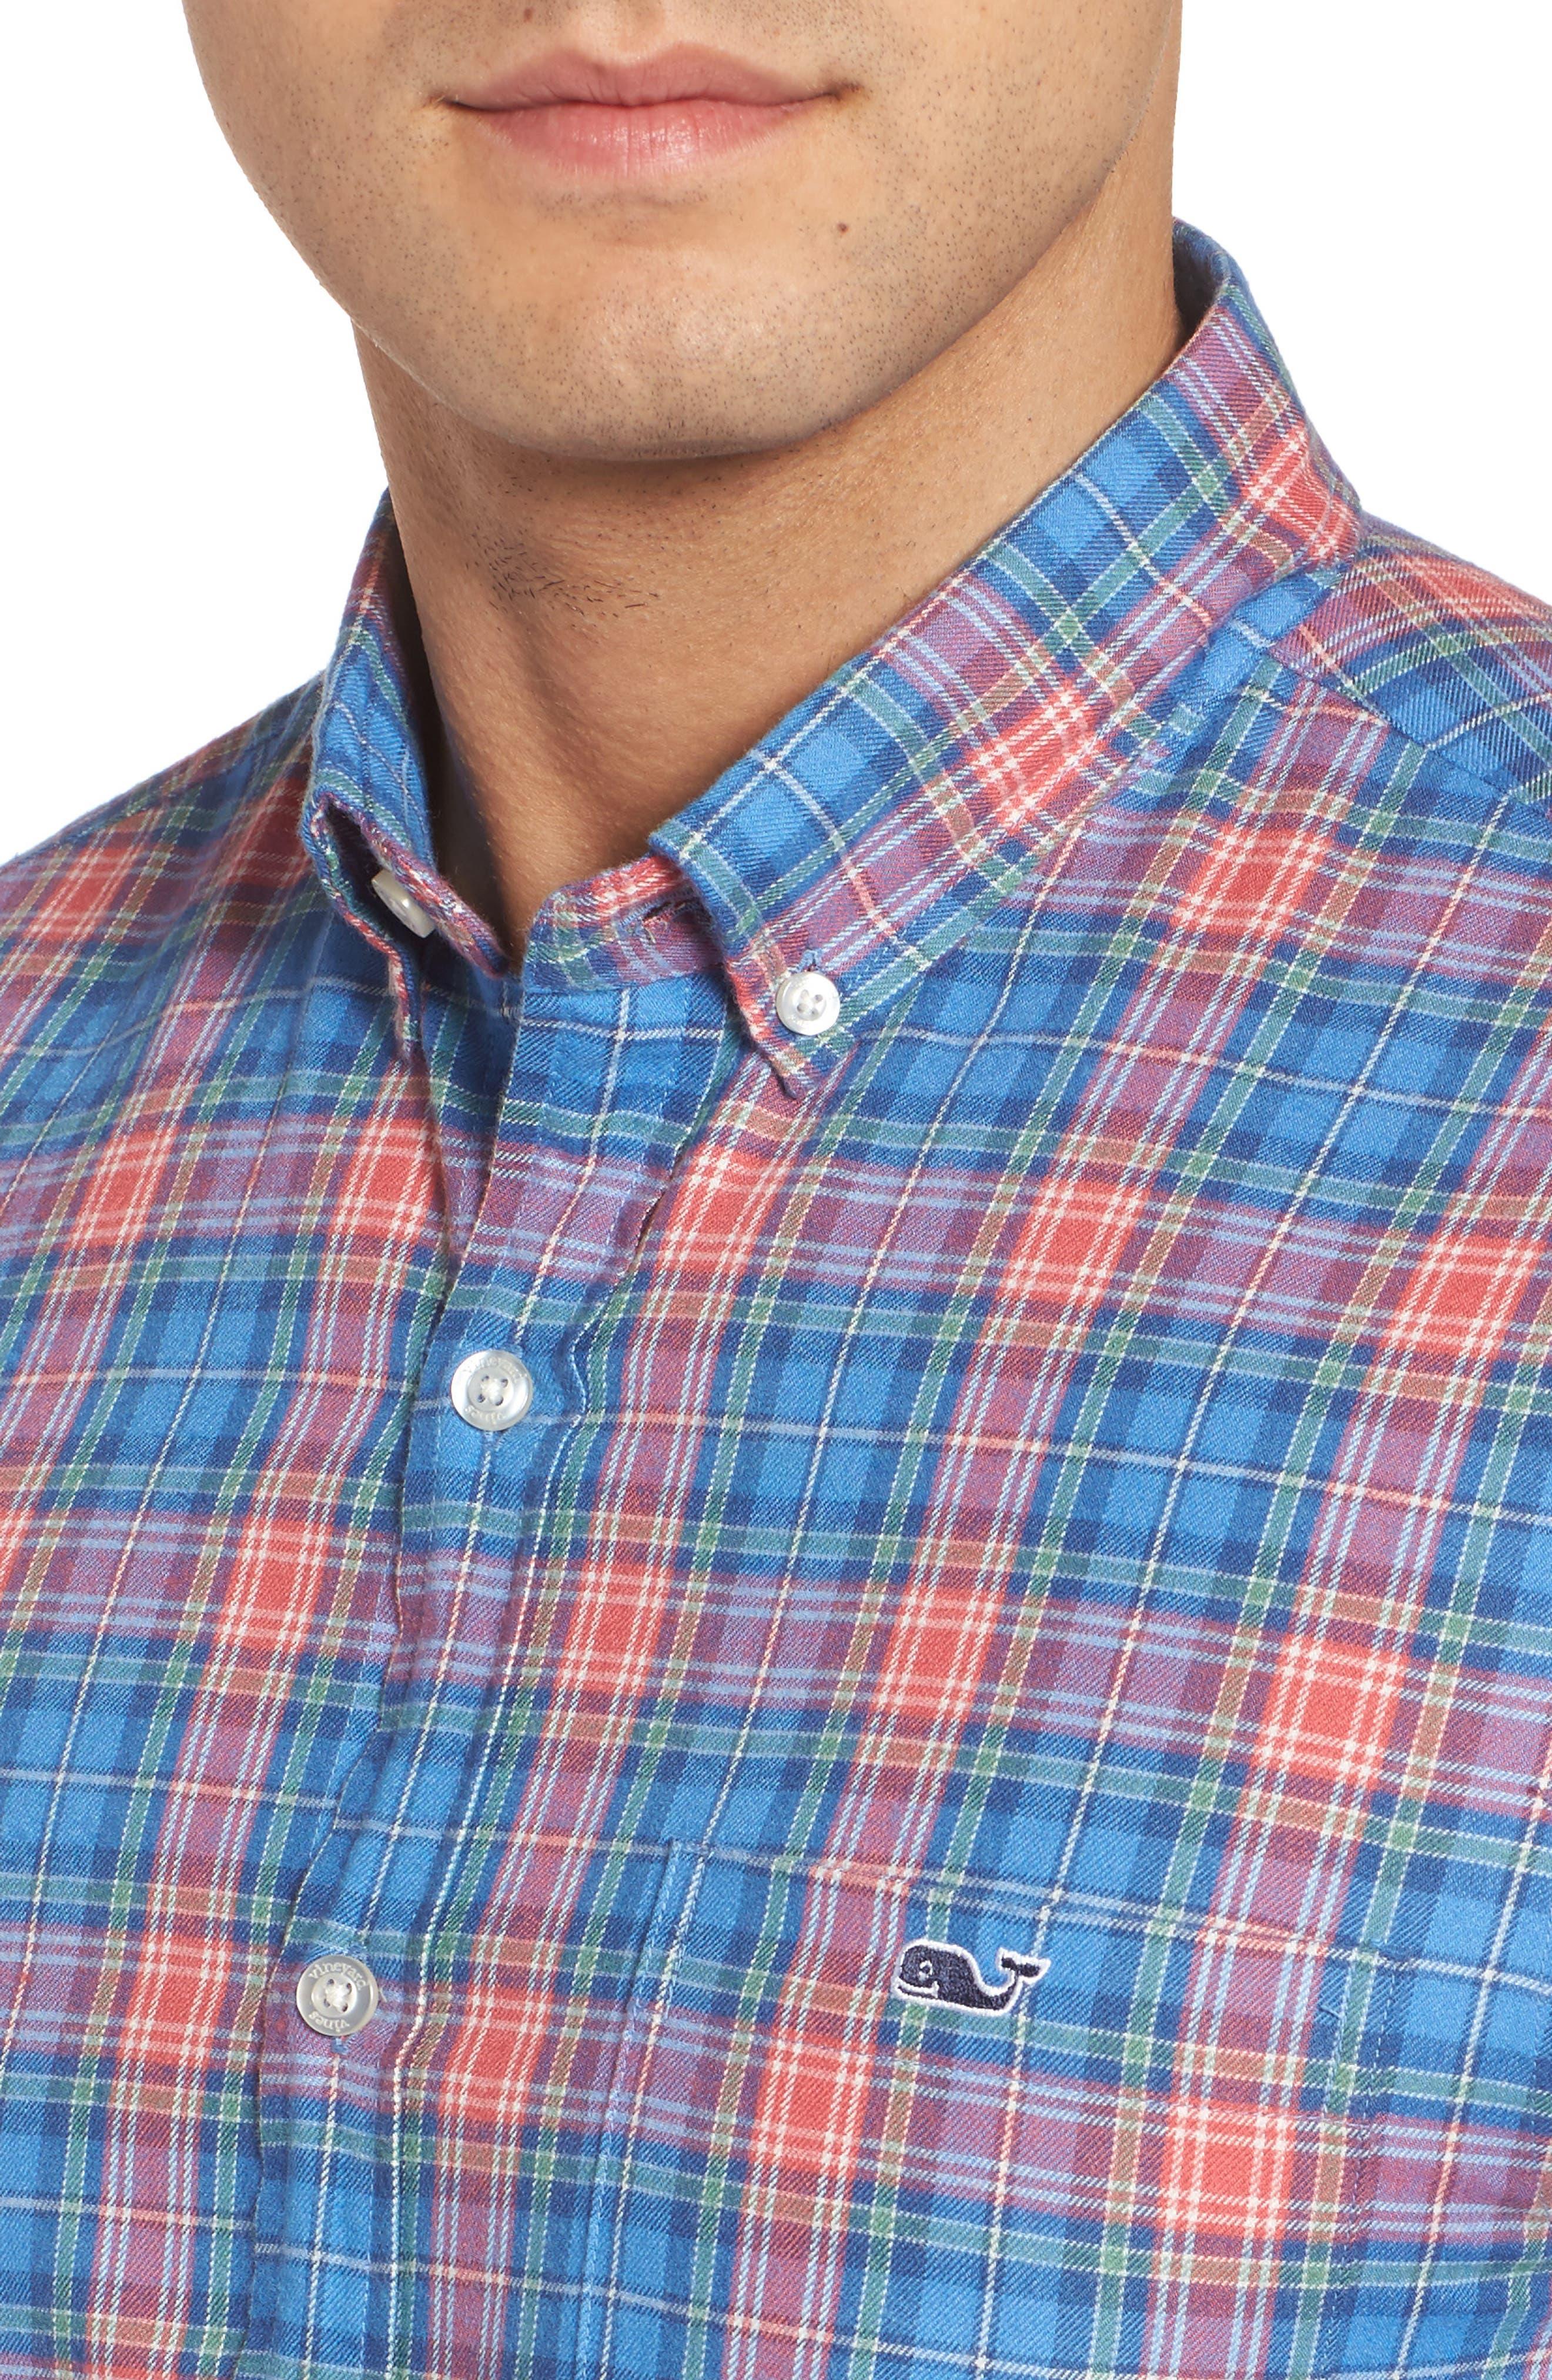 Kingsley Park Slim Fit Plaid Sport Shirt,                             Alternate thumbnail 4, color,                             431